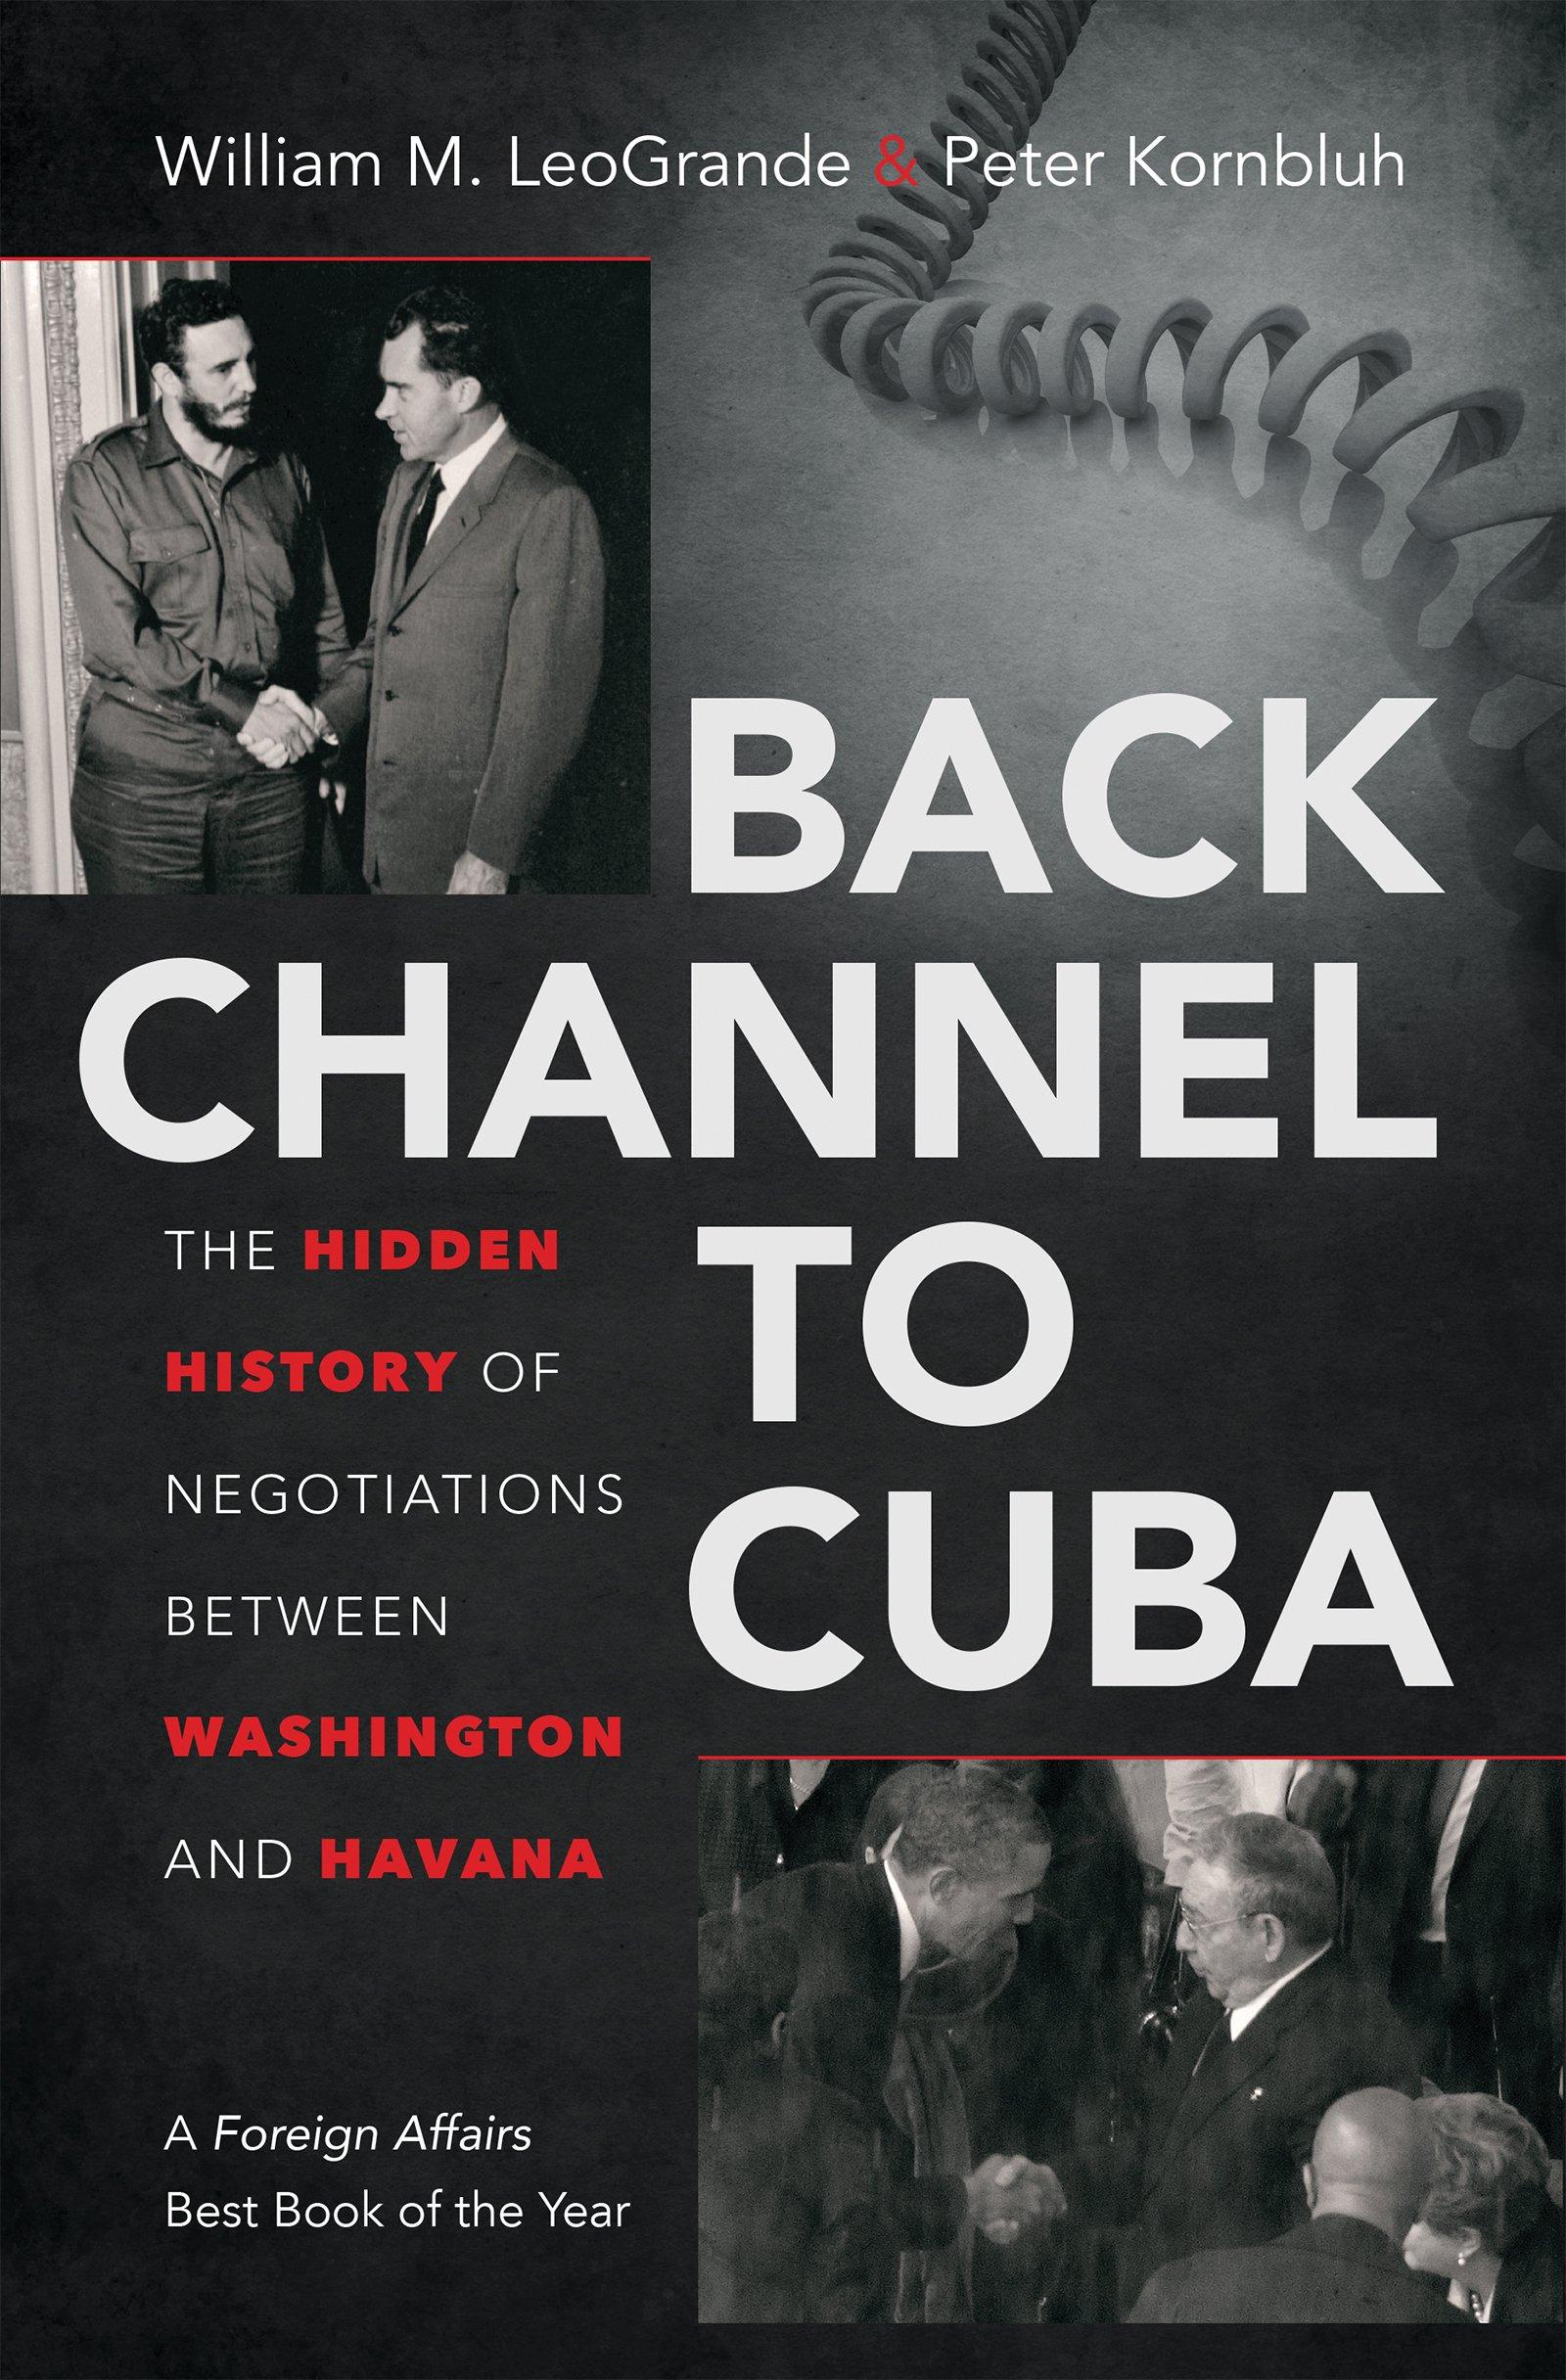 ca2dec3b0da4de Back Channel to Cuba: The Hidden History of Negotiations Between Washington  and Havana (Englisch) Gebundenes Buch – 13. Oktober 2014